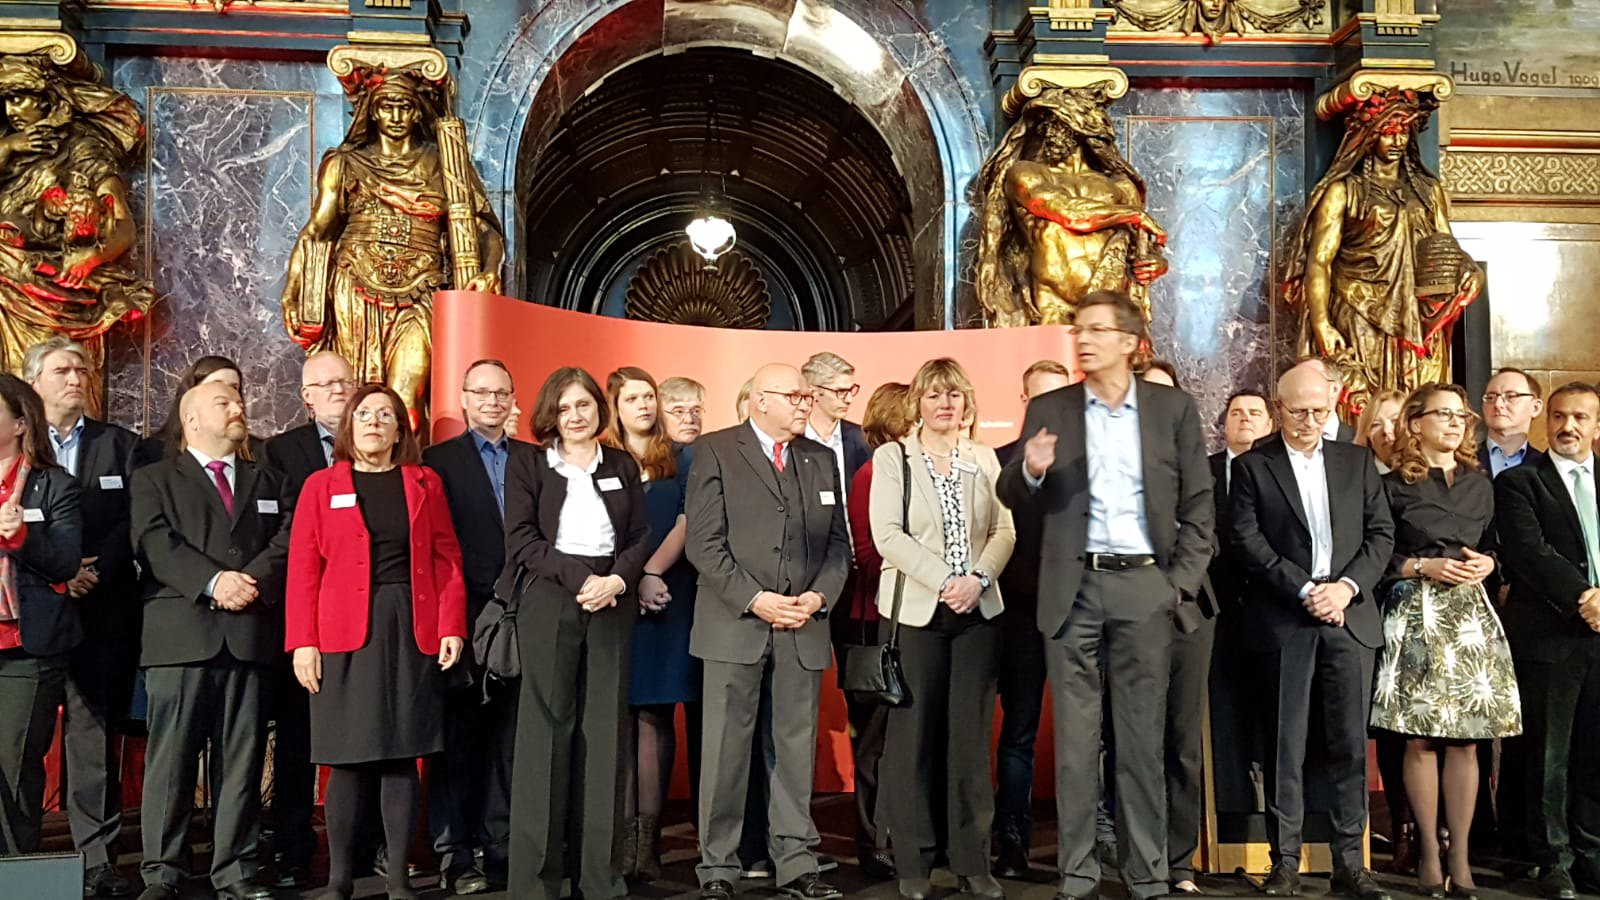 Neujahrsempfang der SPD Bürgerschaftsfraktion 2019